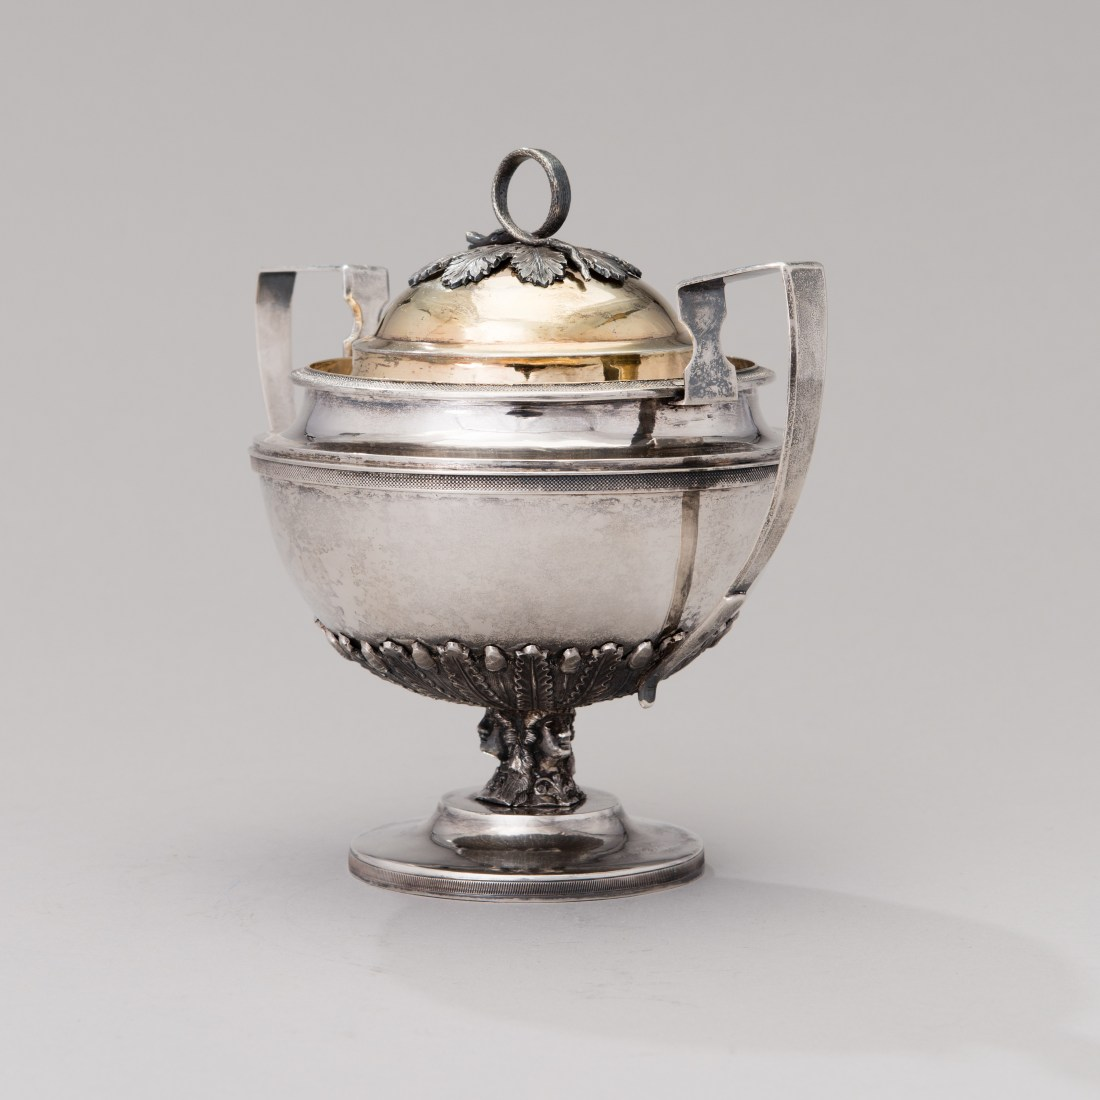 Sugar bowl with lid. 1816.